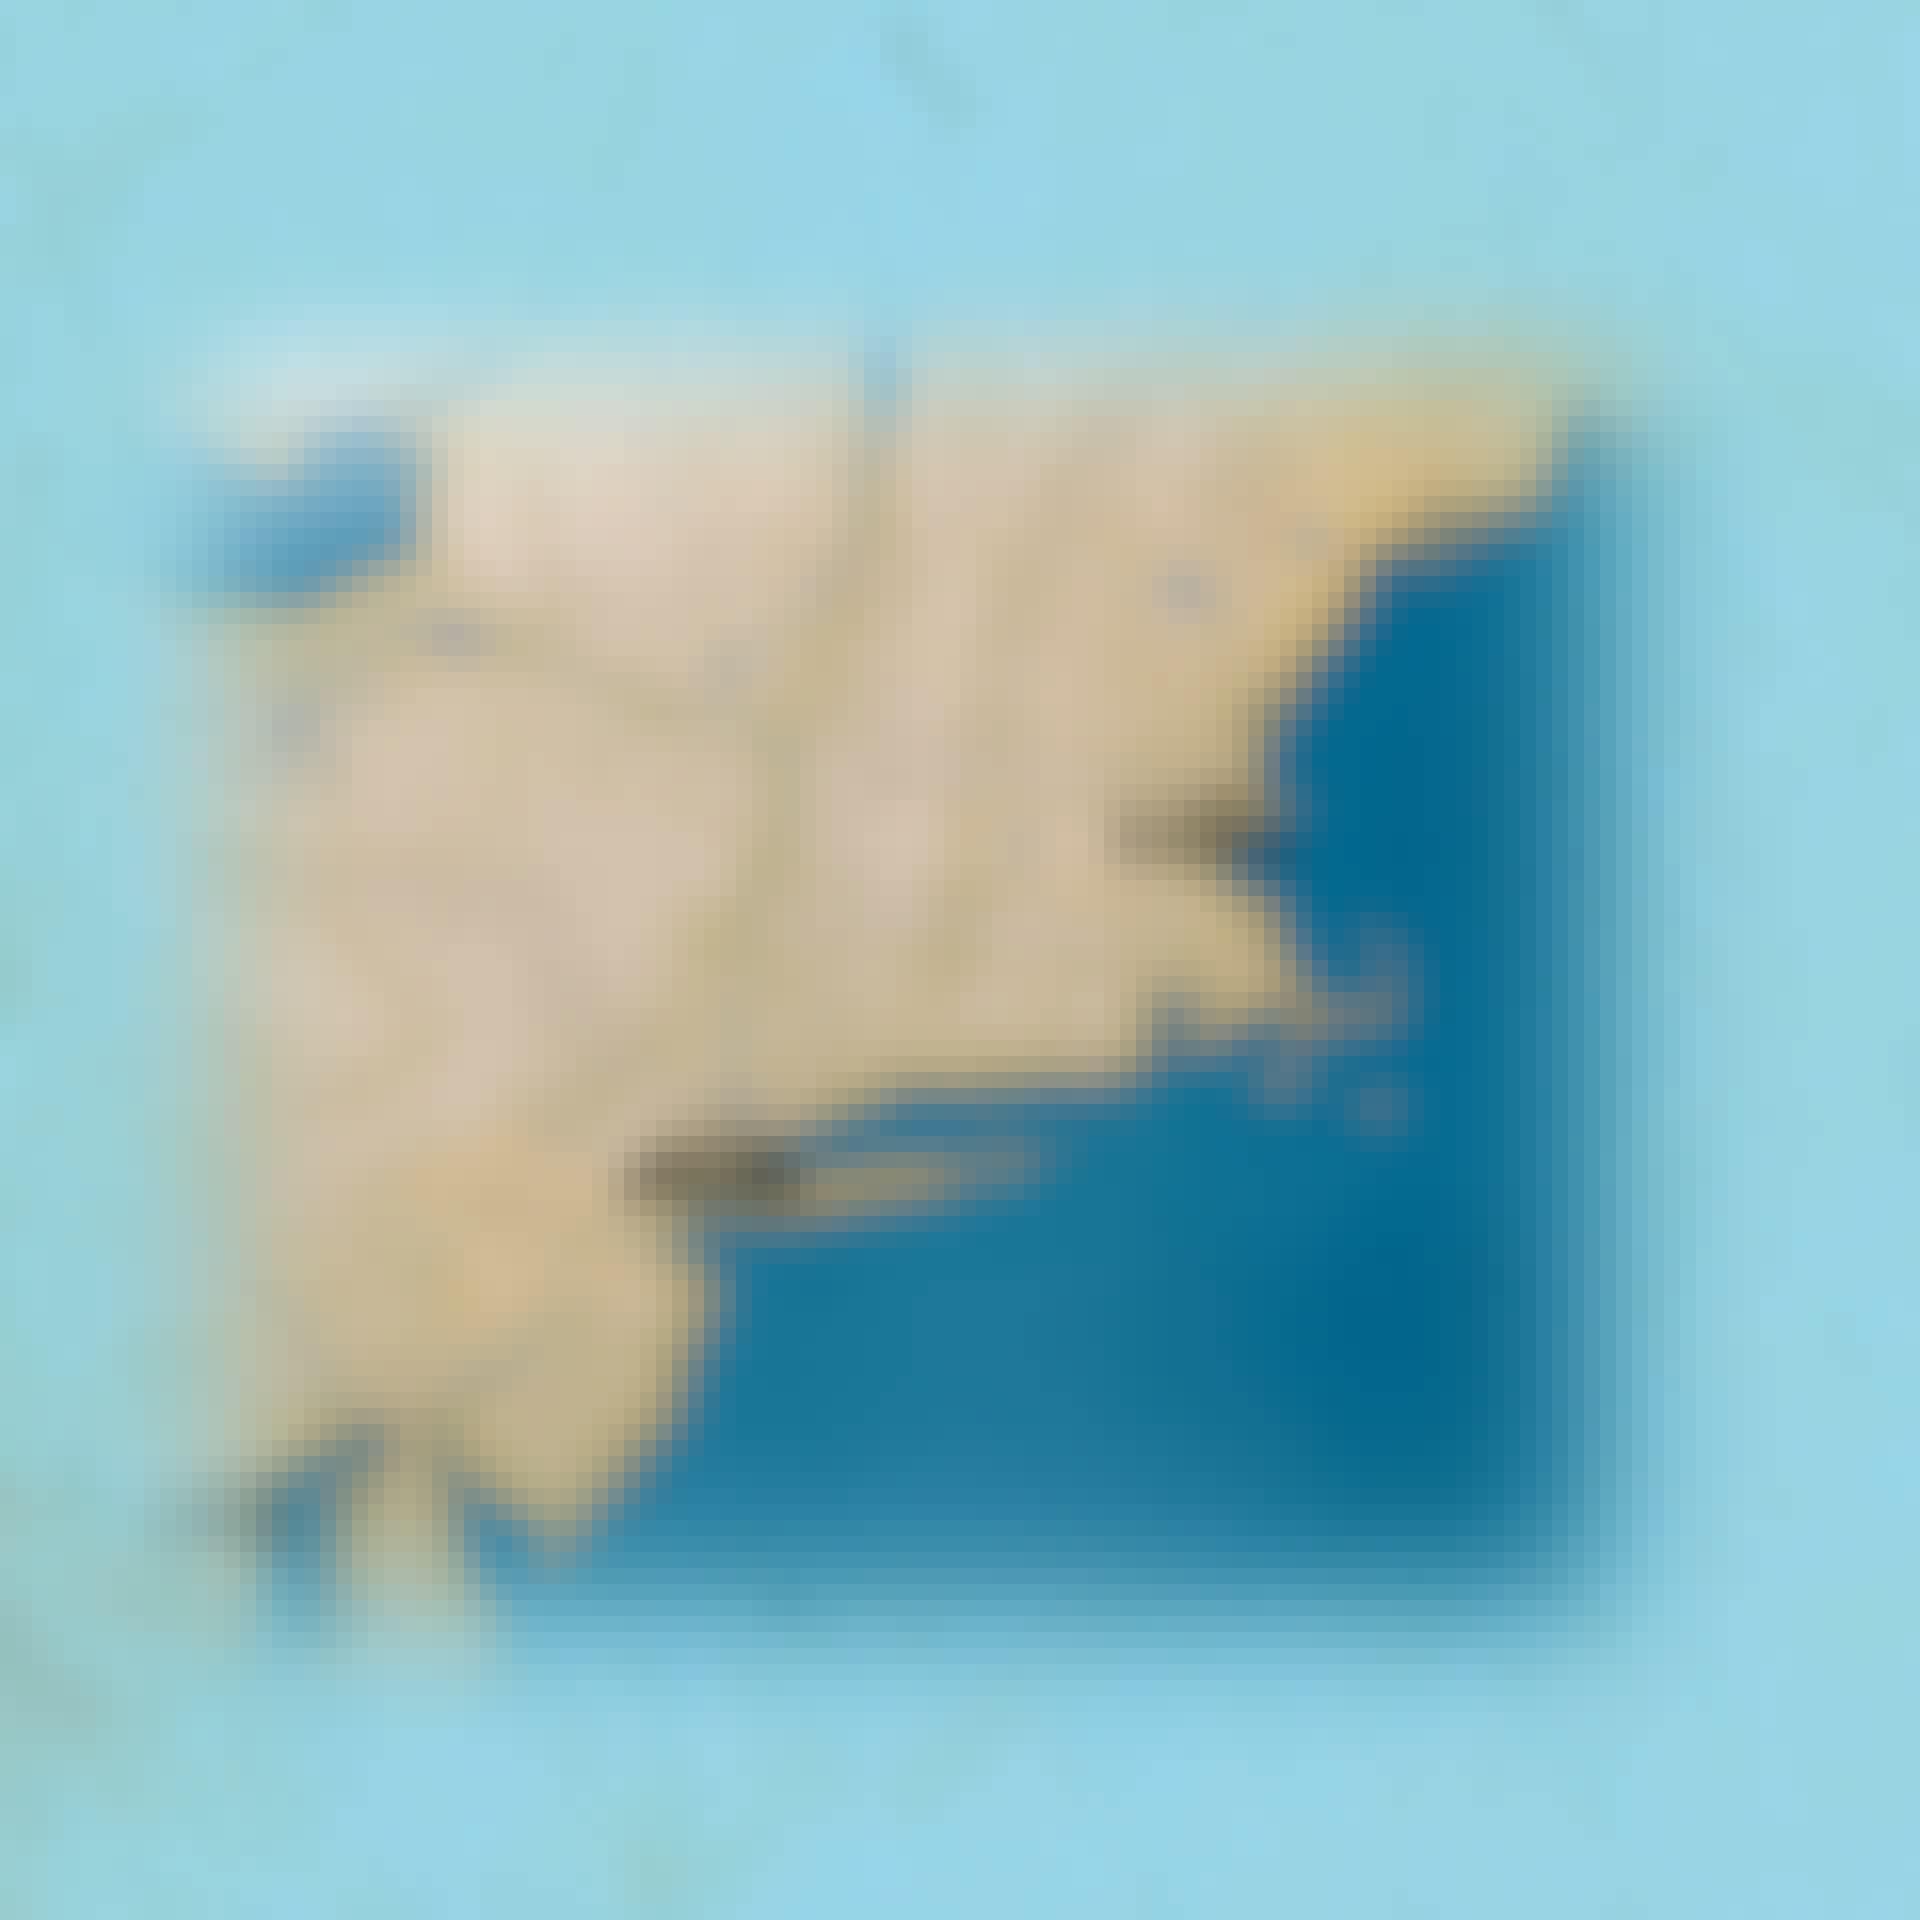 Kort over American Airlines Flight 11s rute mod nordtårnet